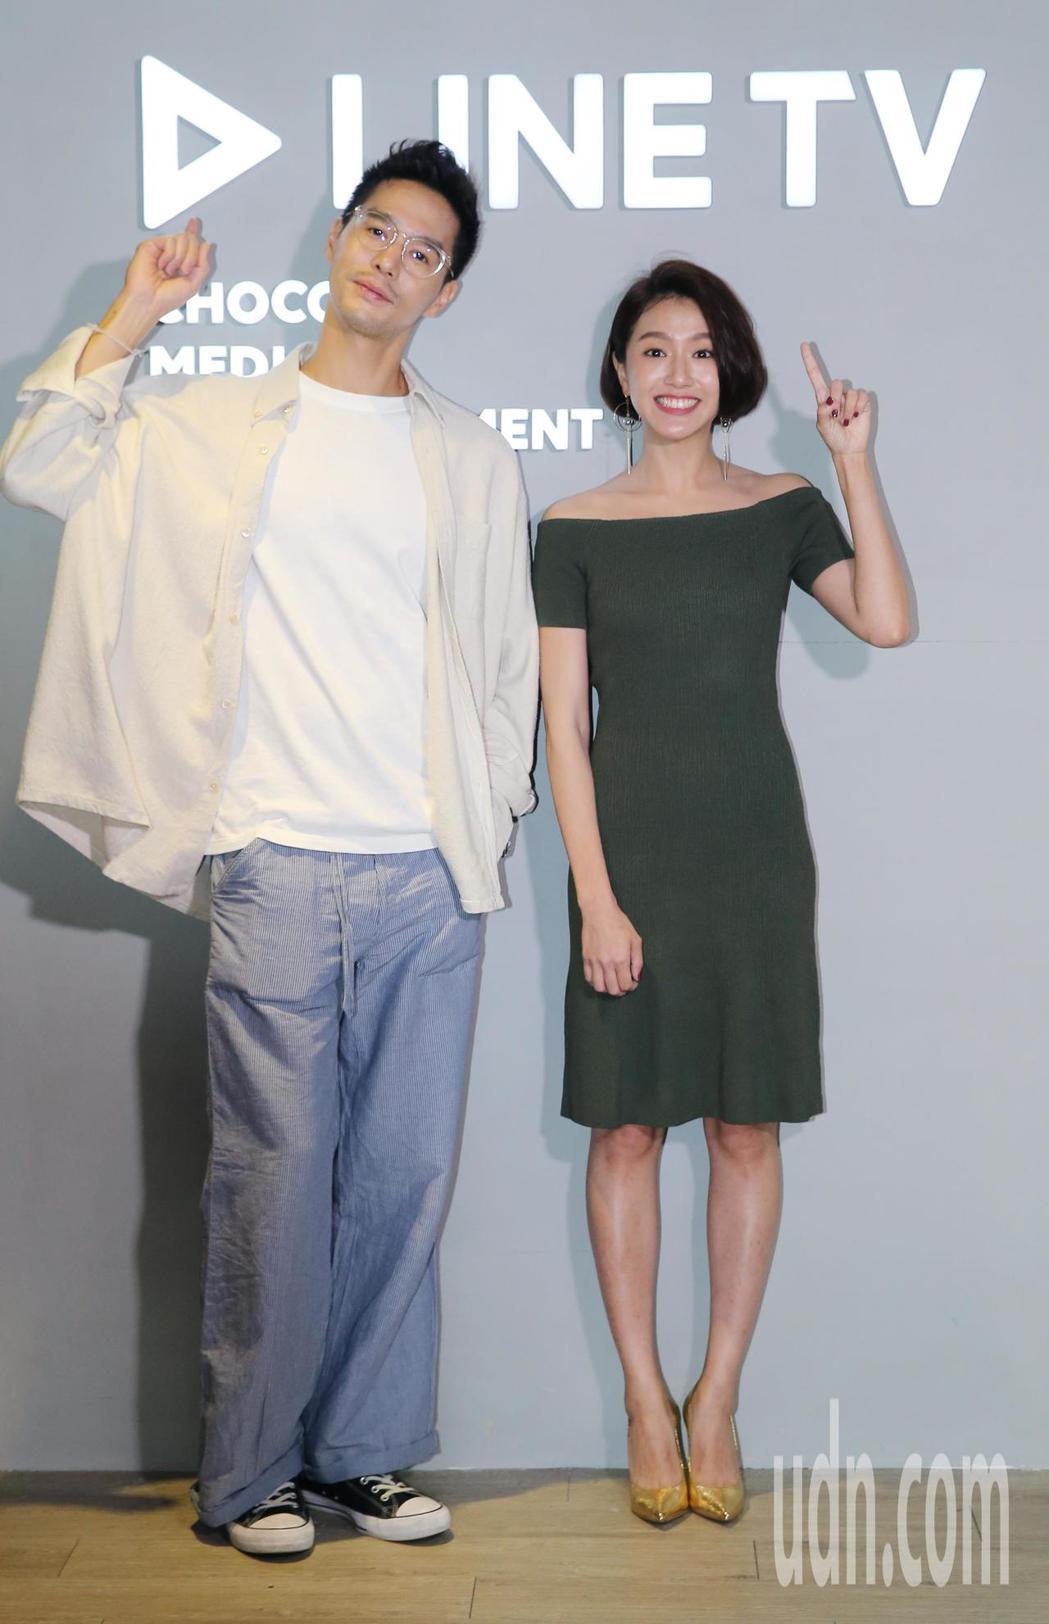 LINE TV新戲「圈套」,片中演員丁春誠(左)、林意箴(右)接受媒體聯訪。記者